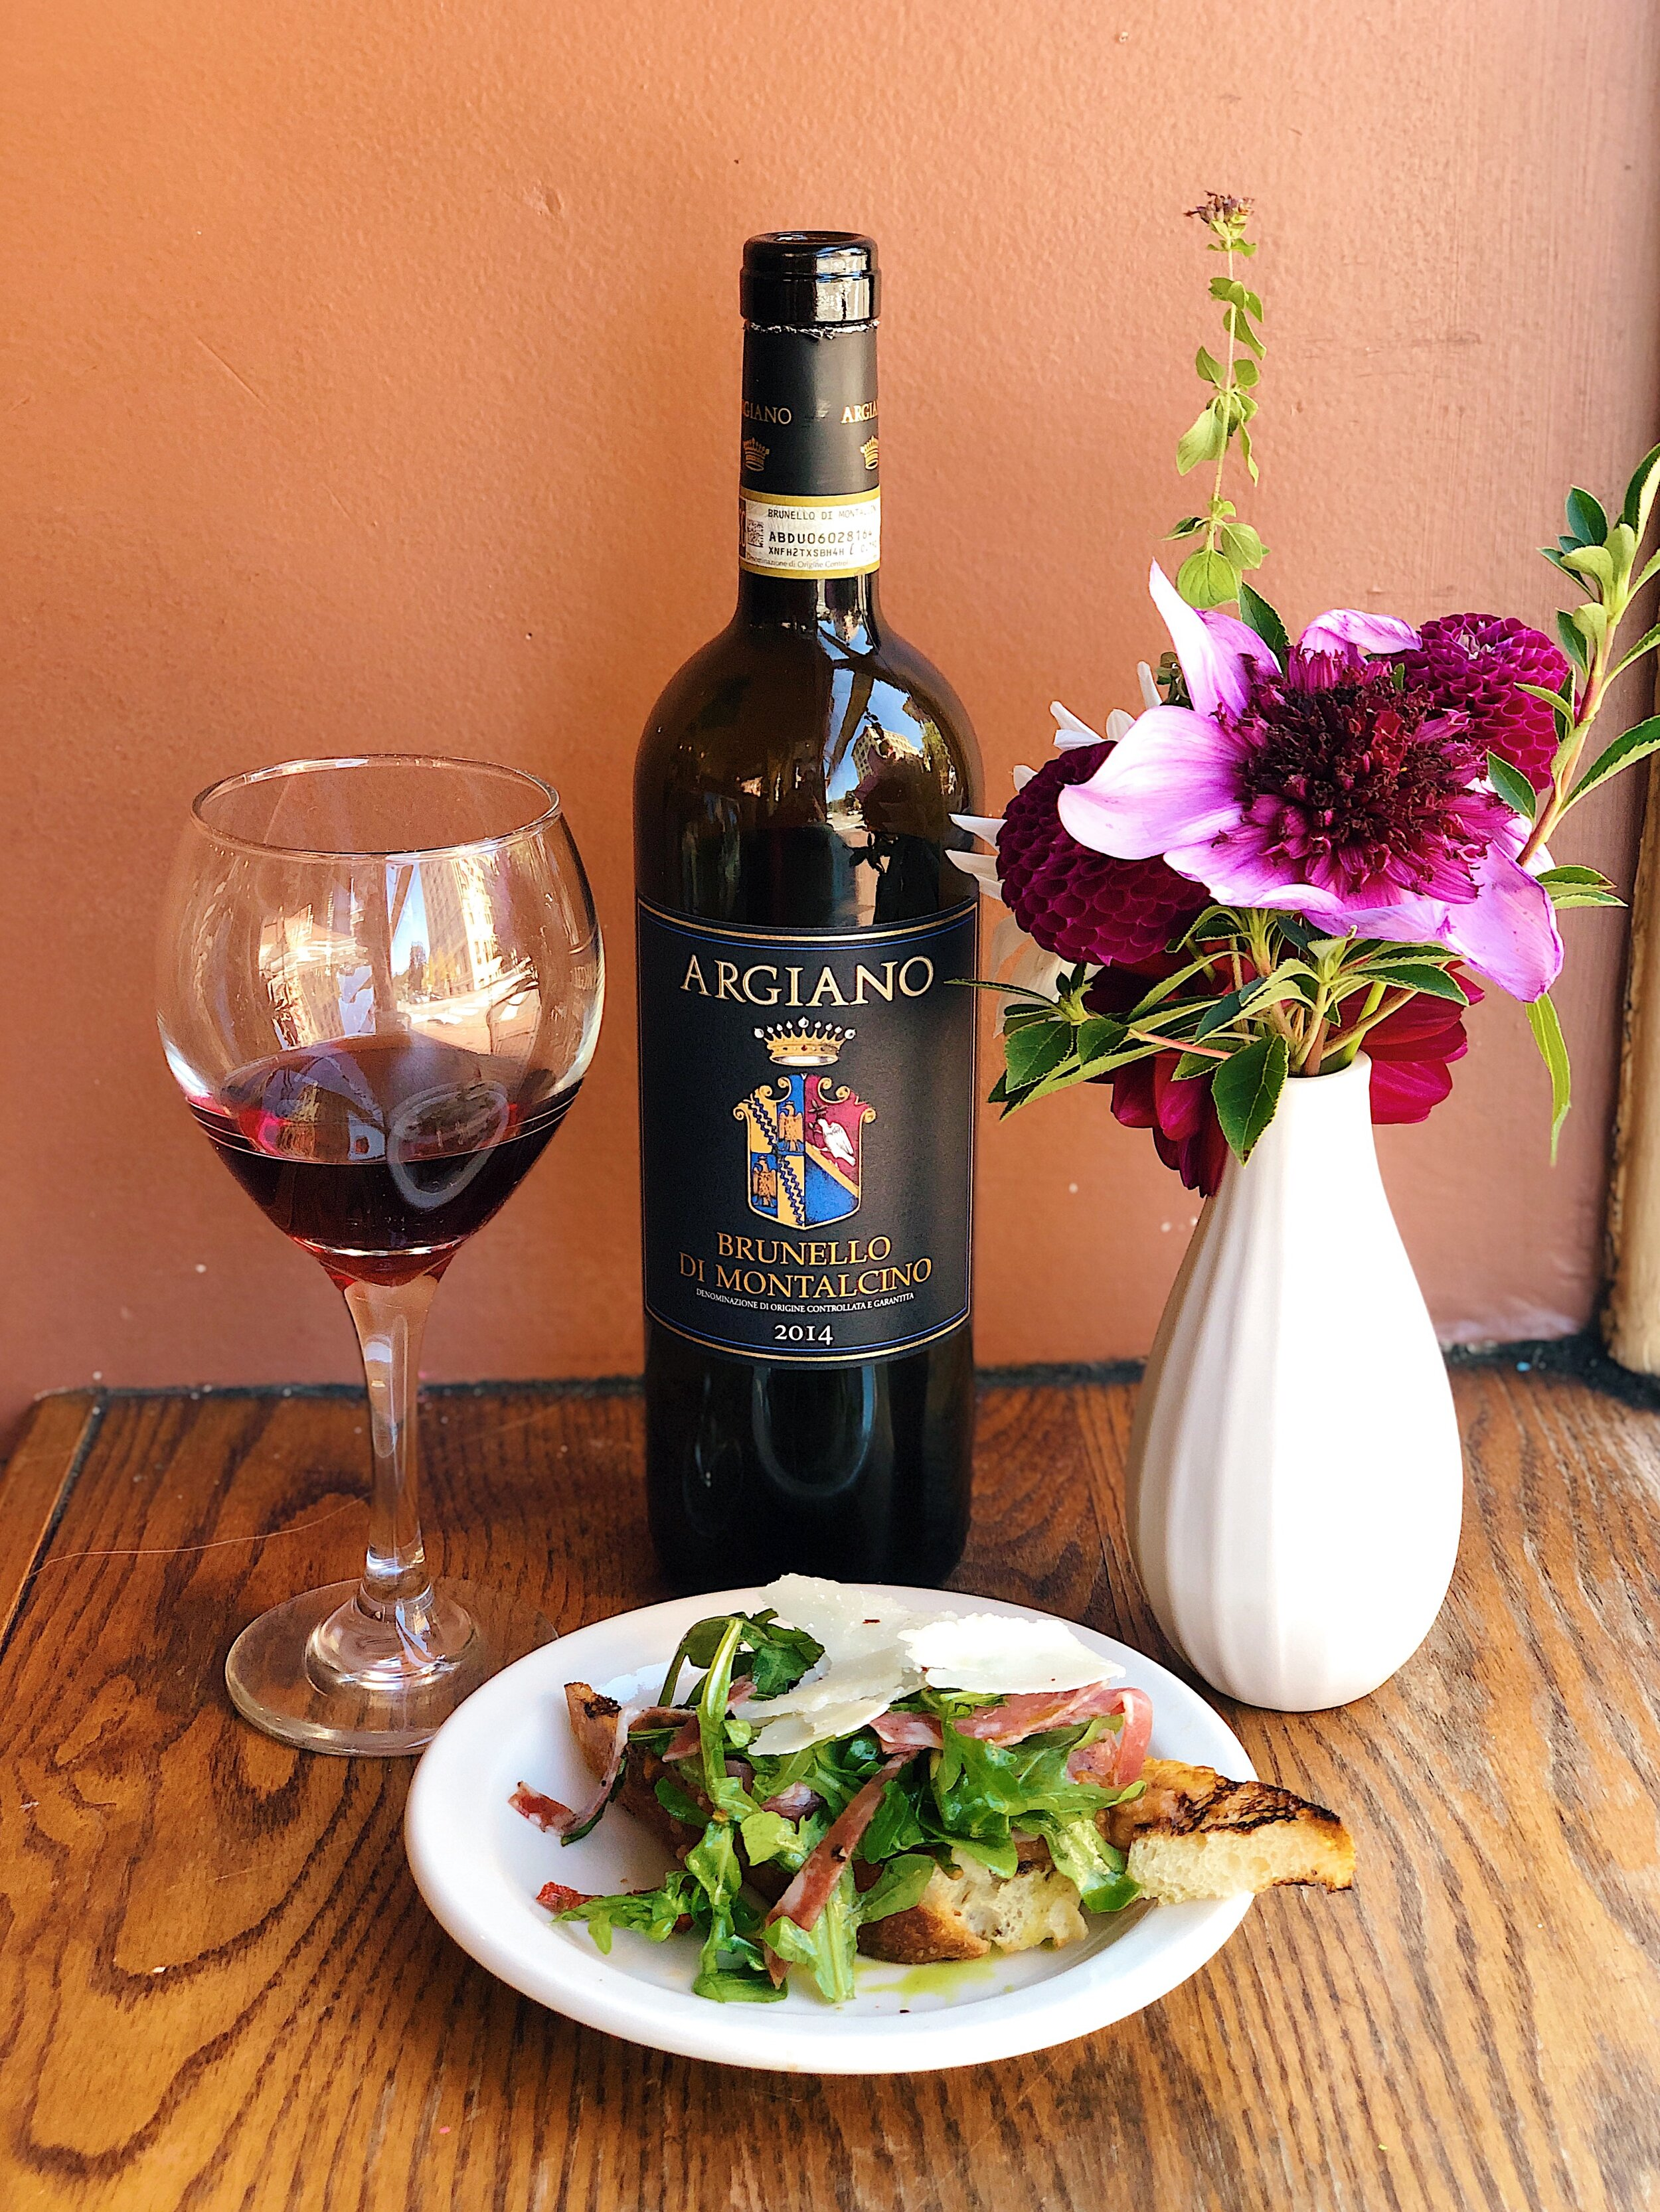 wine_wise_events_wine_food_walk_winewalk_brunello_red_tcr_cornerroom_italian_italy2.jpg